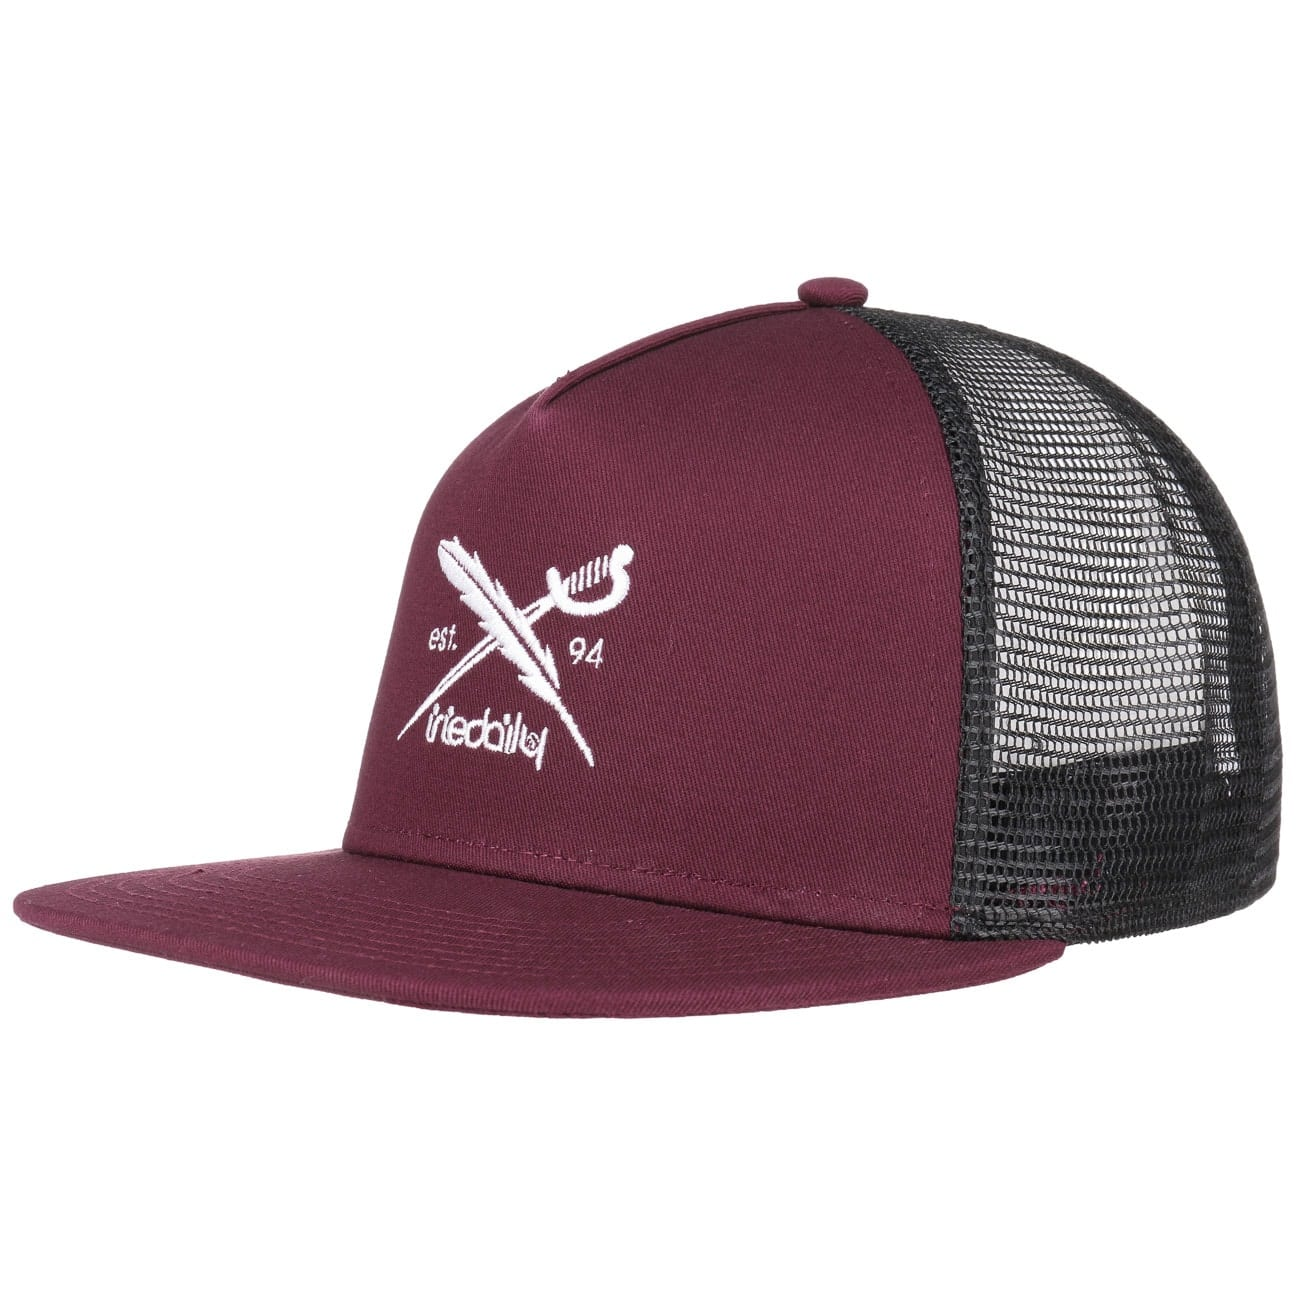 city-mesh-trucker-cap-by-iriedaily-baseballcap